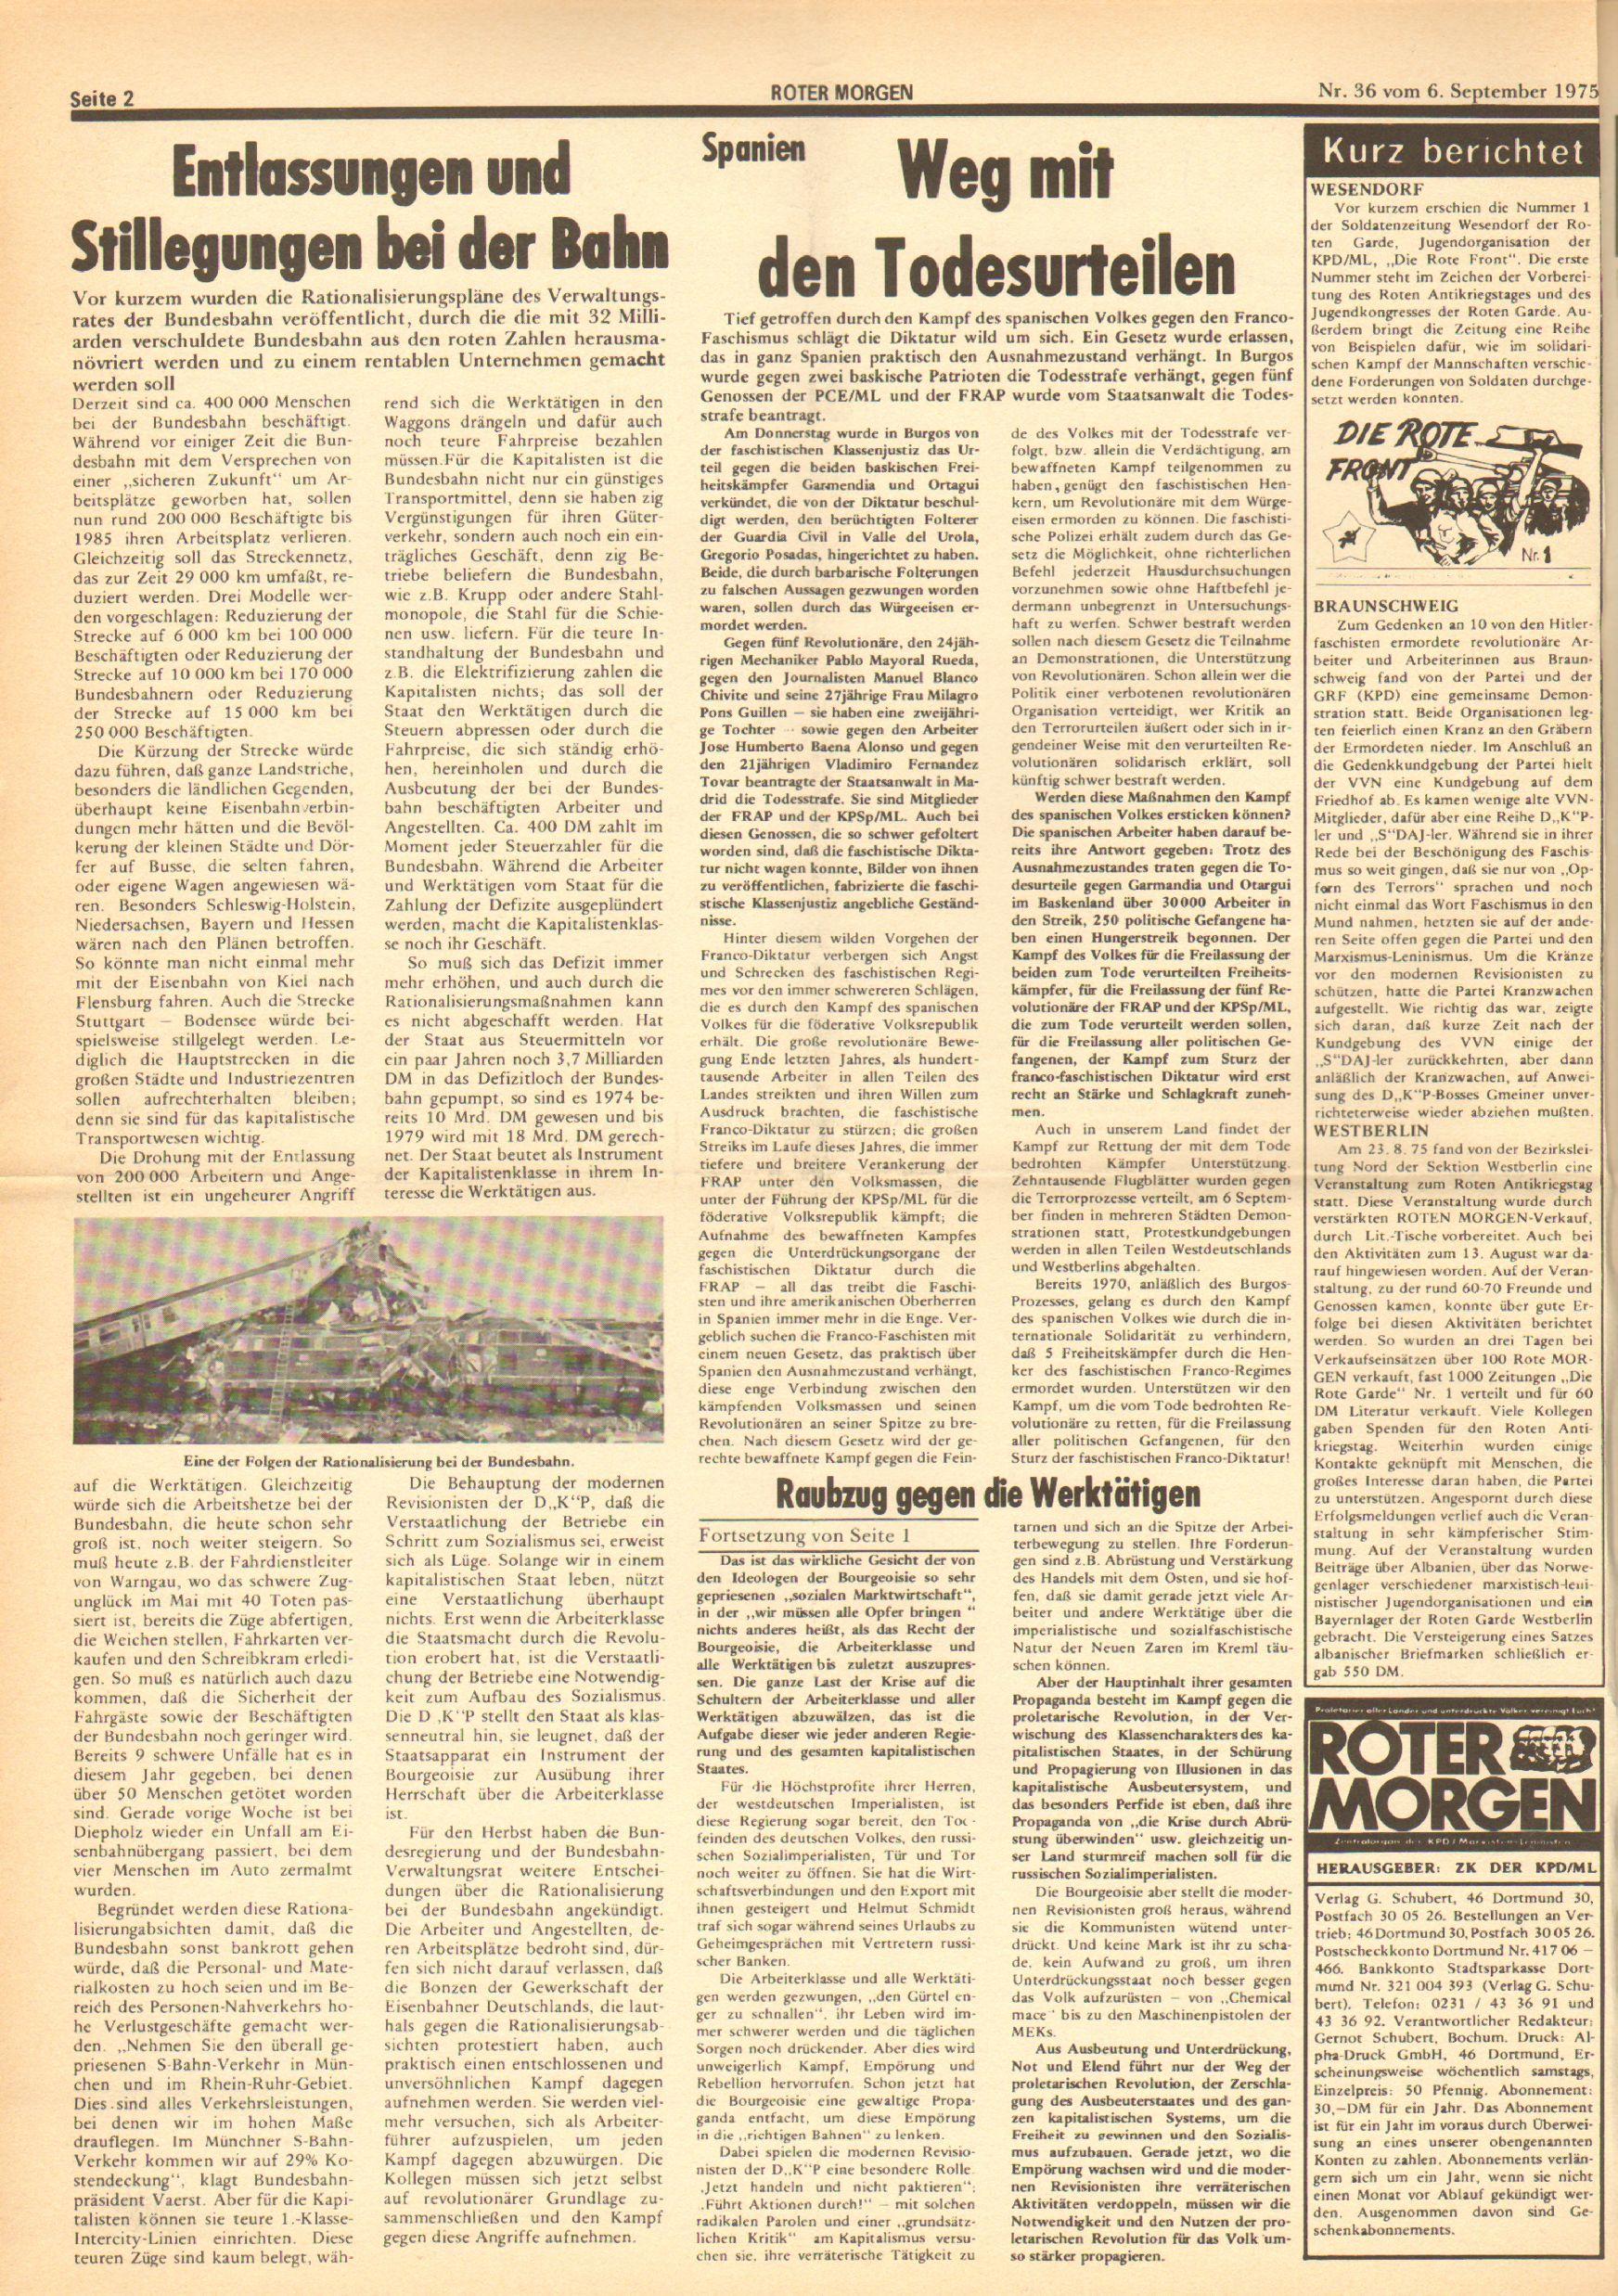 Roter Morgen, 9. Jg., 6. September 1975, Nr. 36, Seite 2